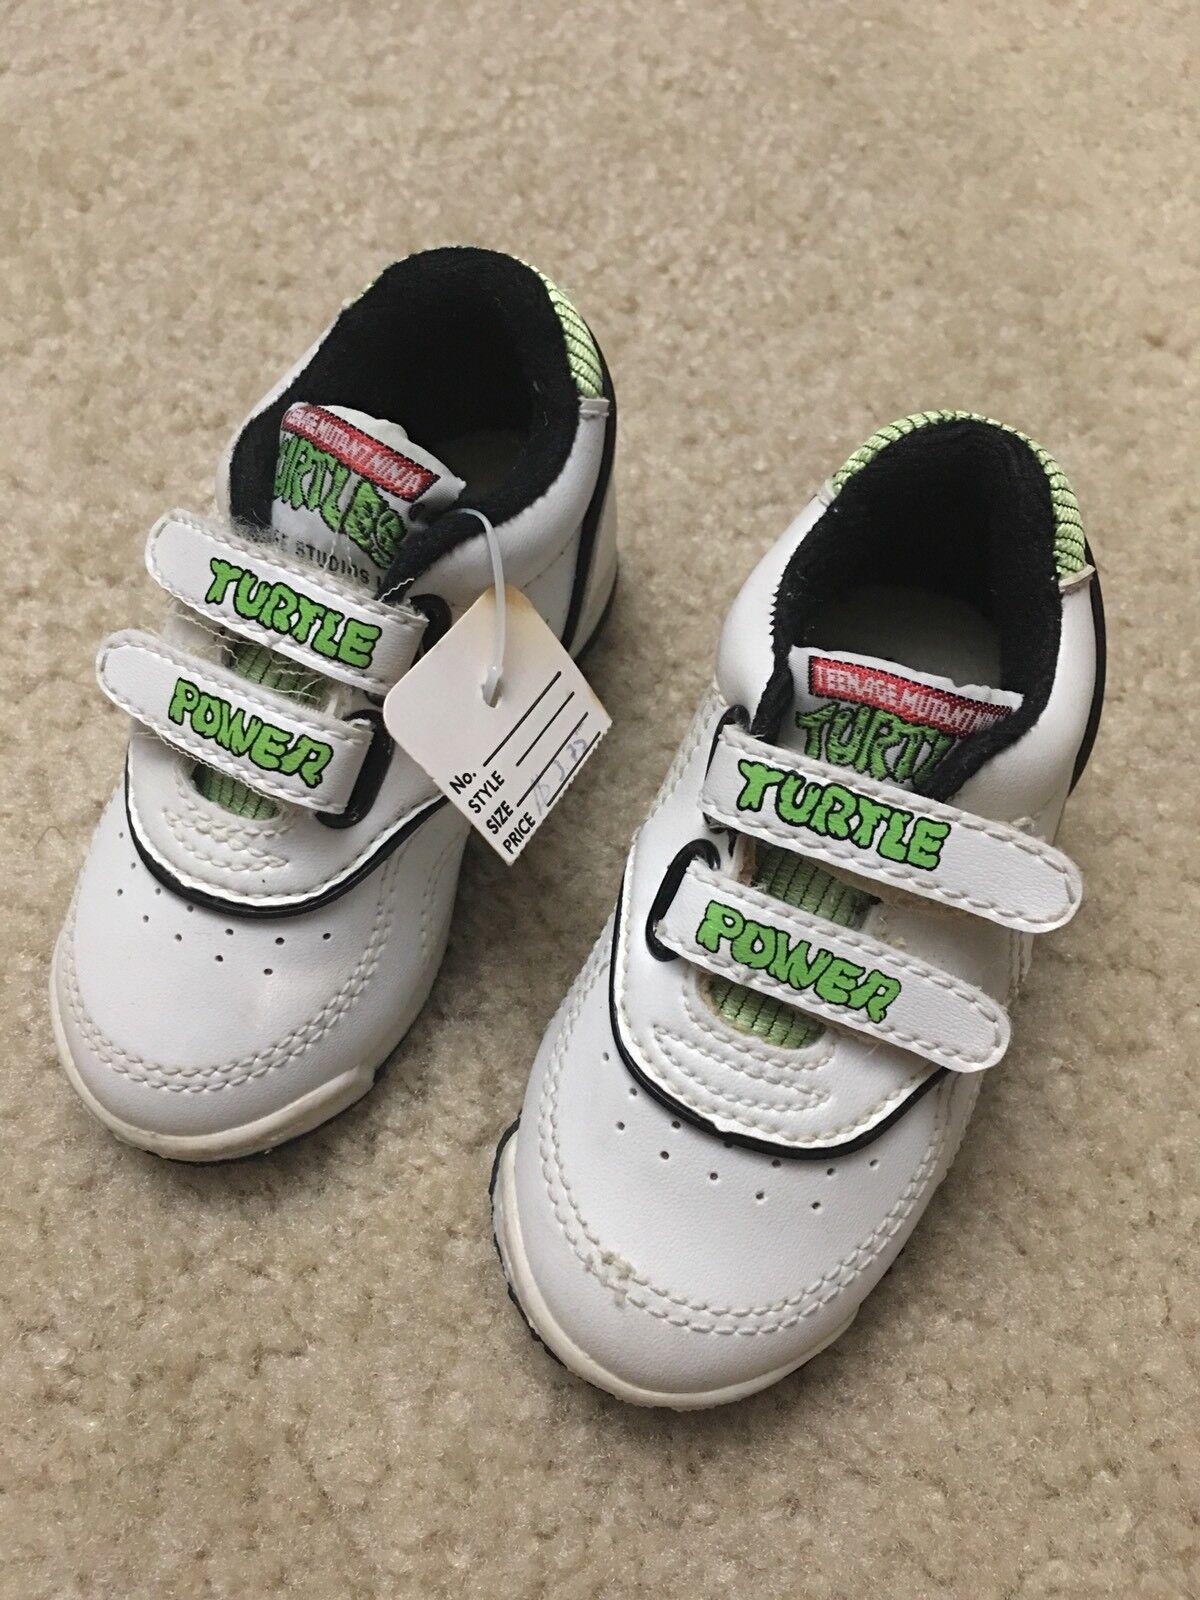 Vintage 1991 TMNT Baby shoes